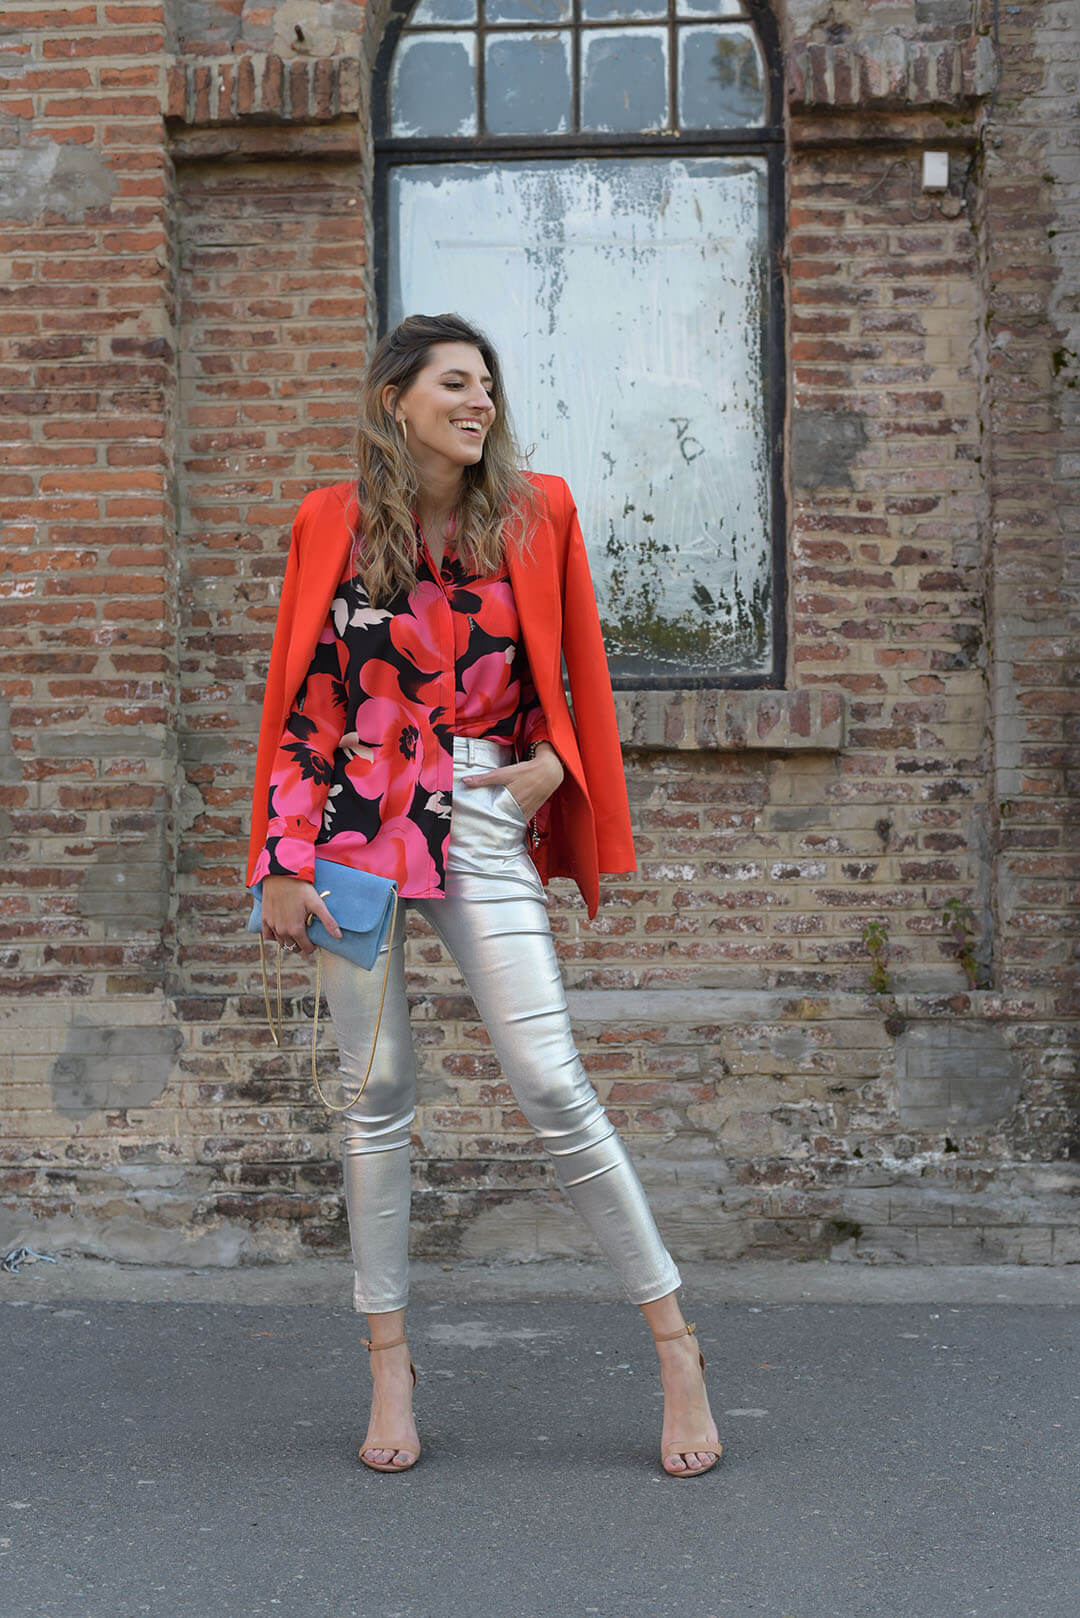 Arreglate conmigo: Estilo Rosario | I'm Karenina TV